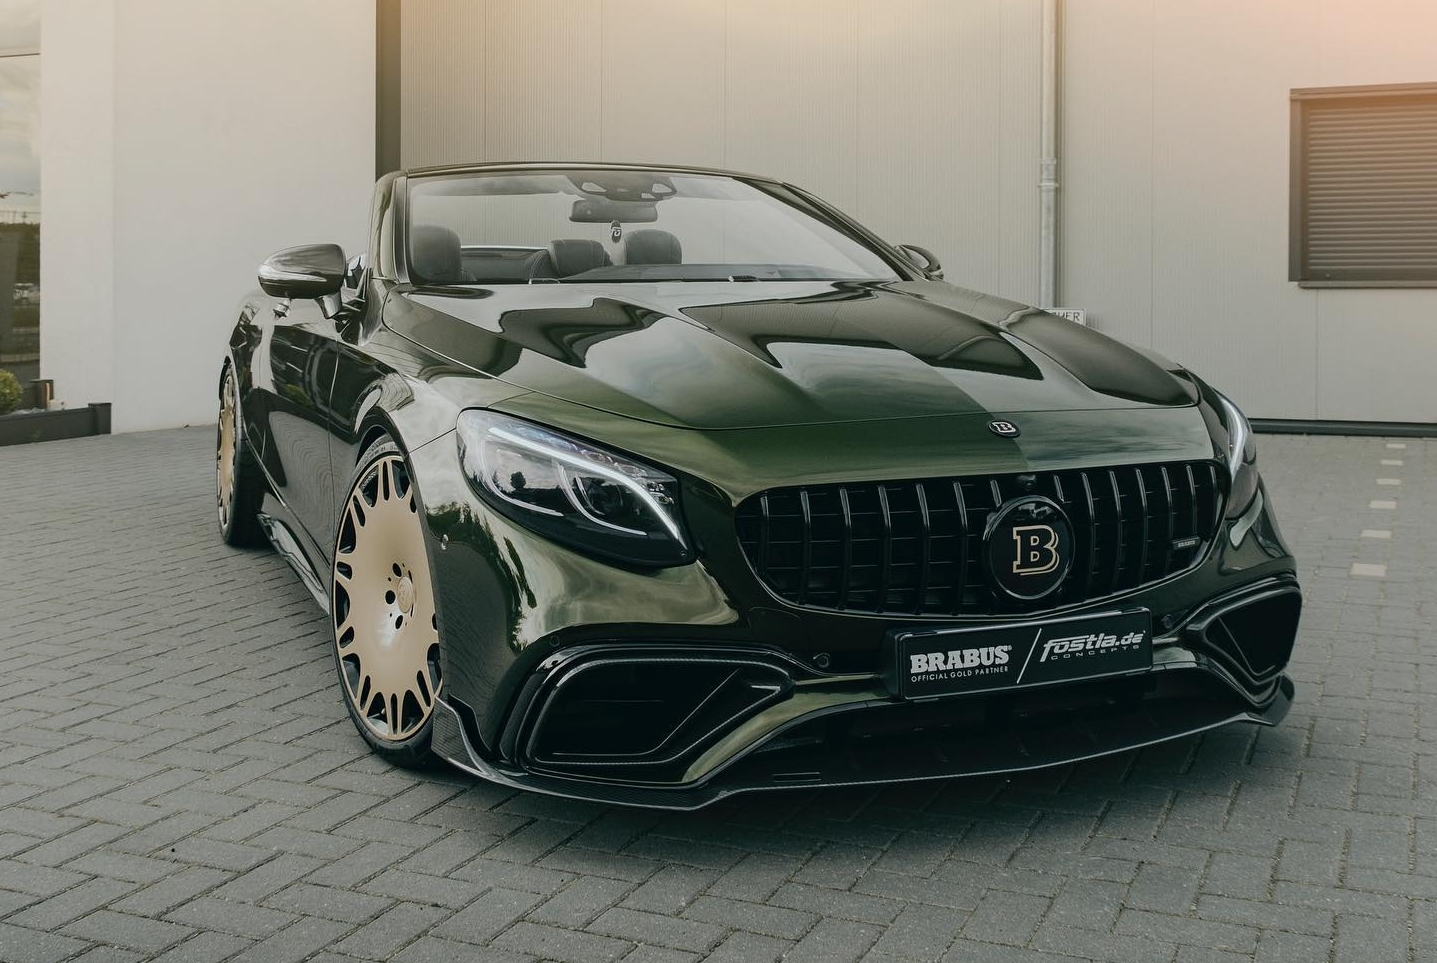 Mercedes-AMG S 63 Cabrio Brabus Fostla